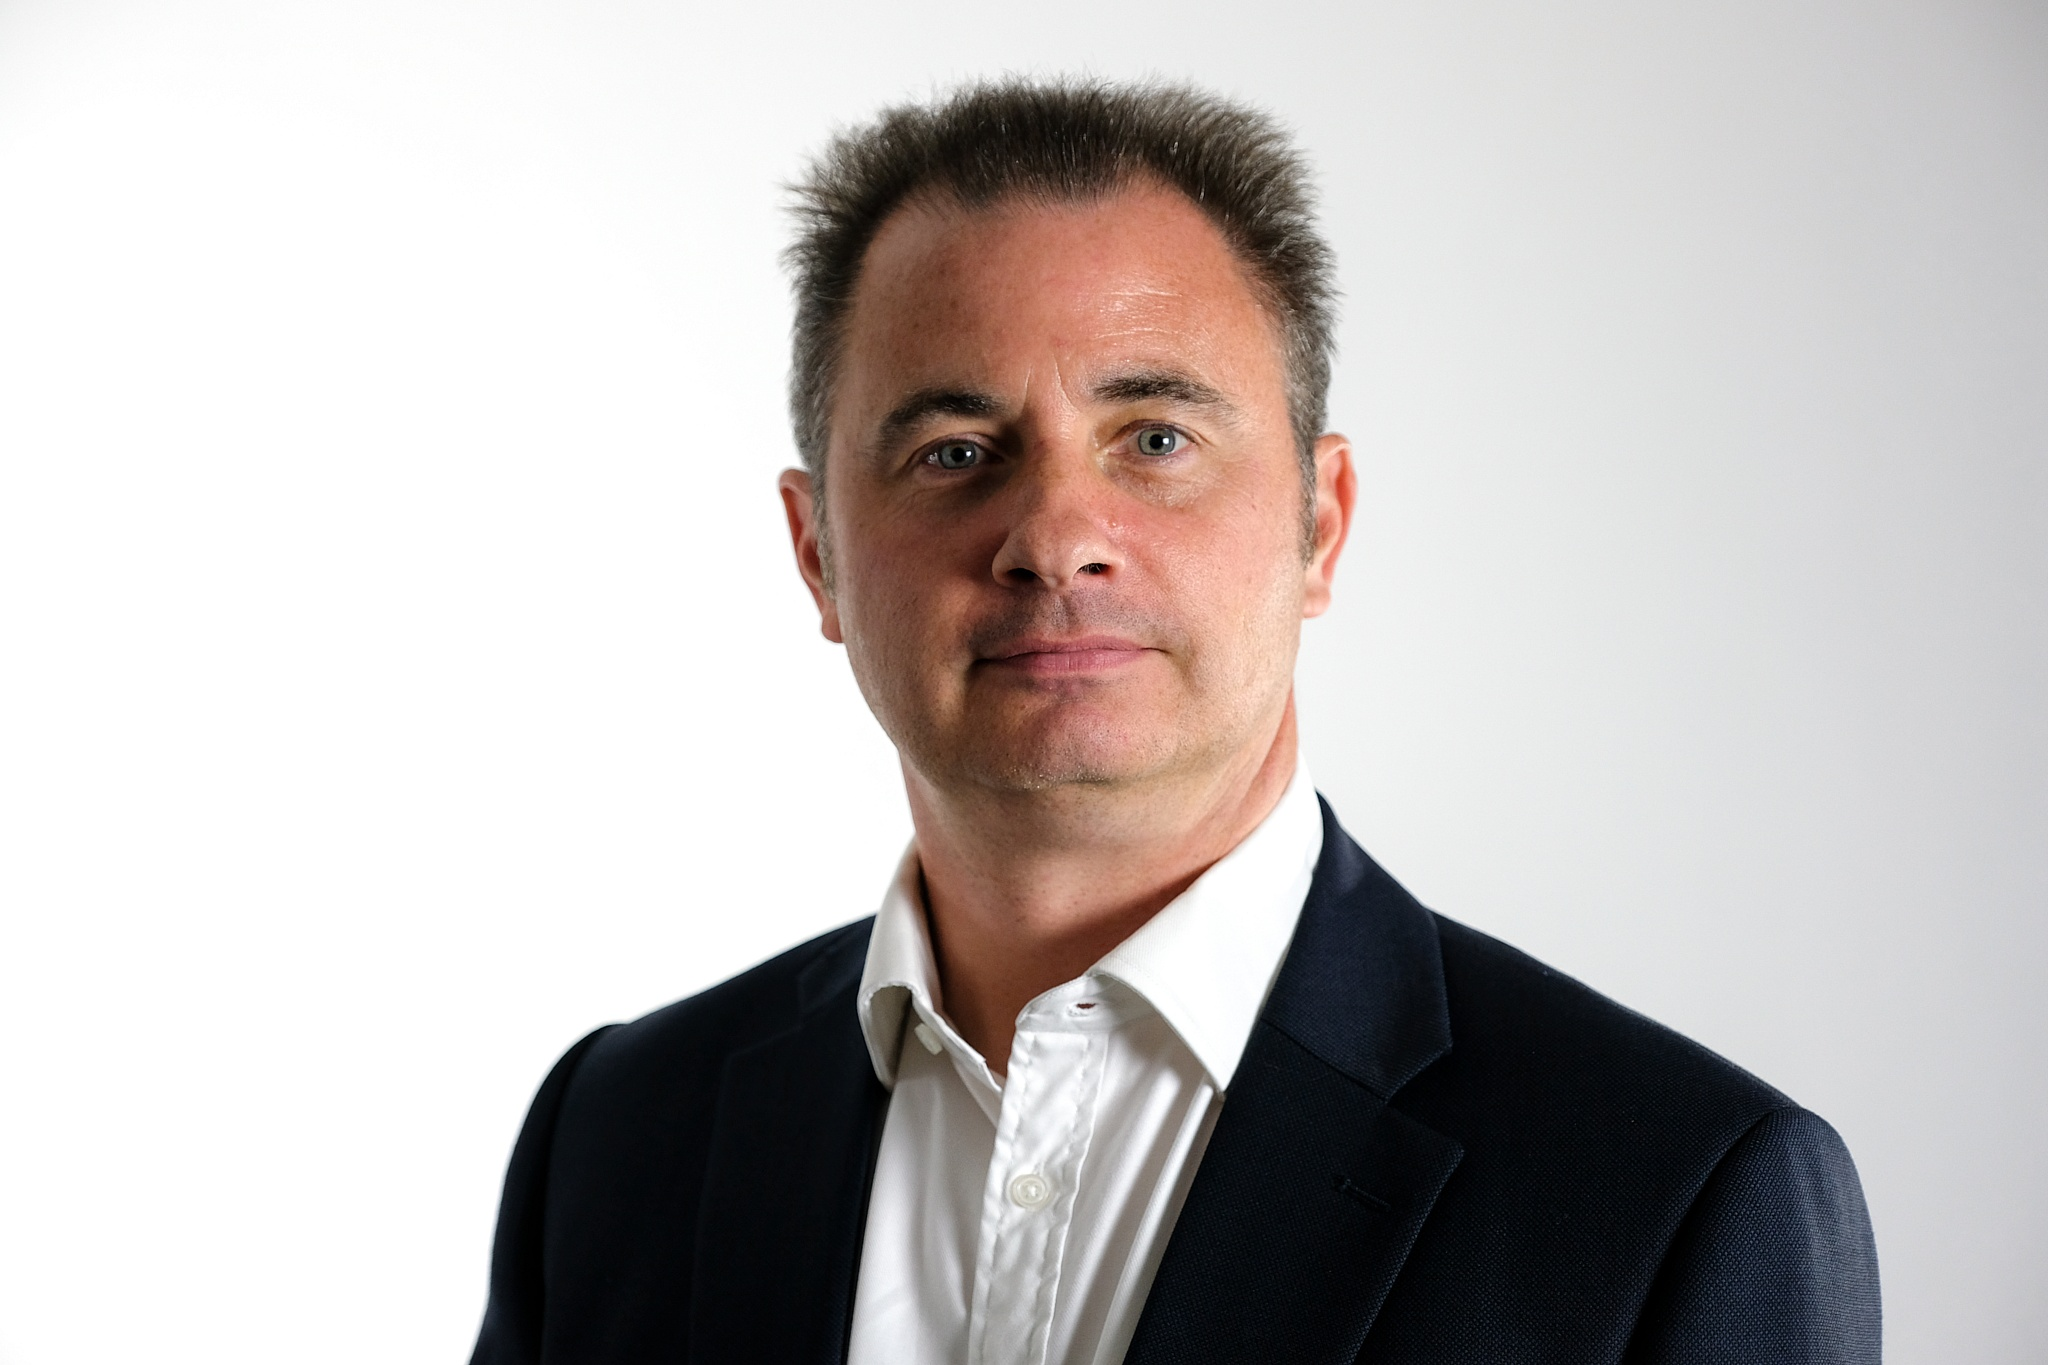 Энди Макбейн (Andy McBain), Zebra Technologies